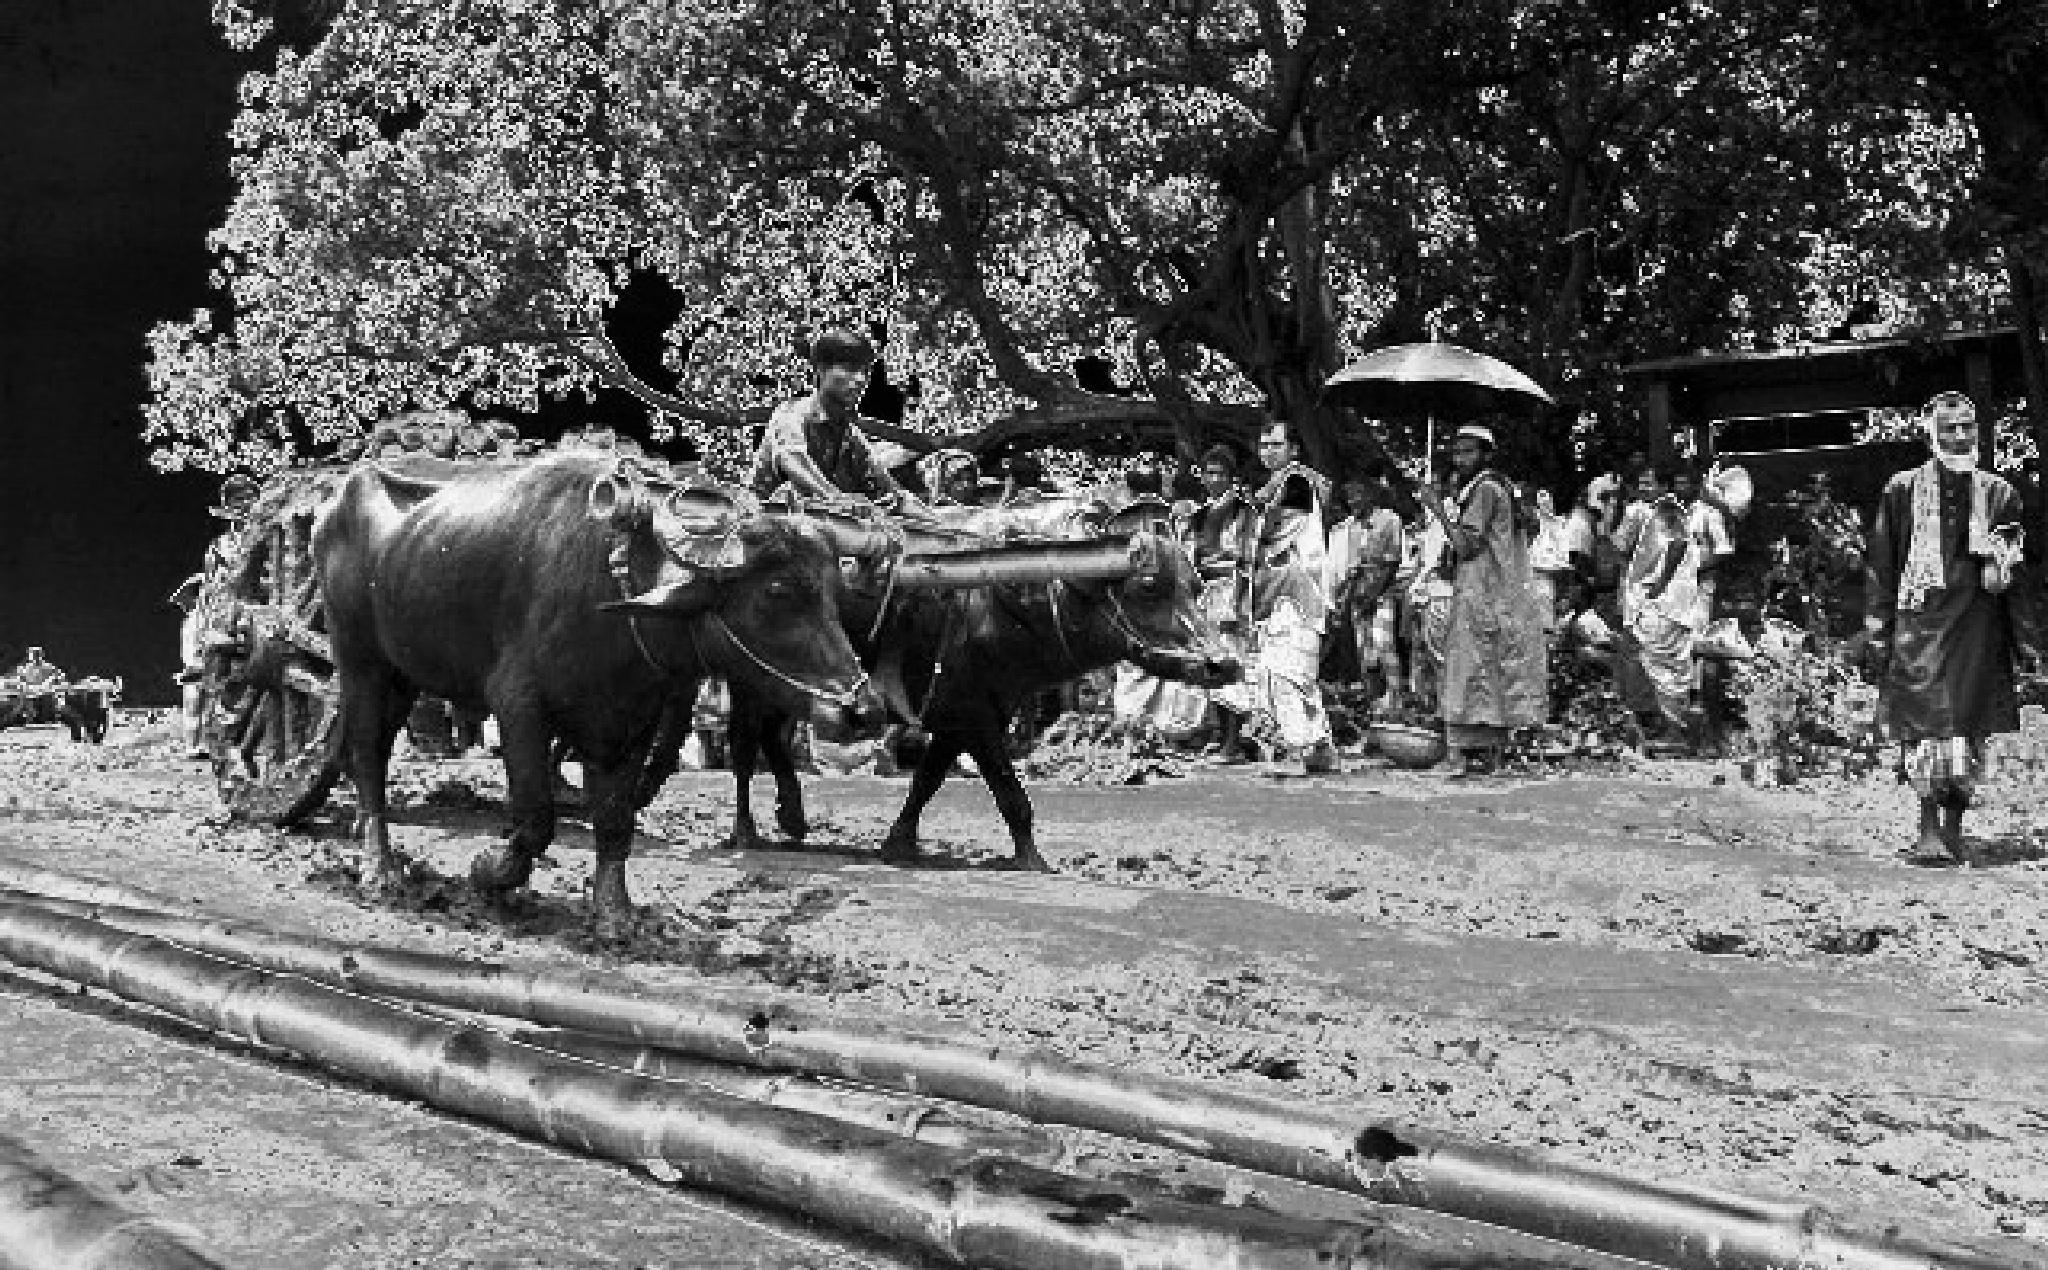 rural diary  by Babul Abdul Malek